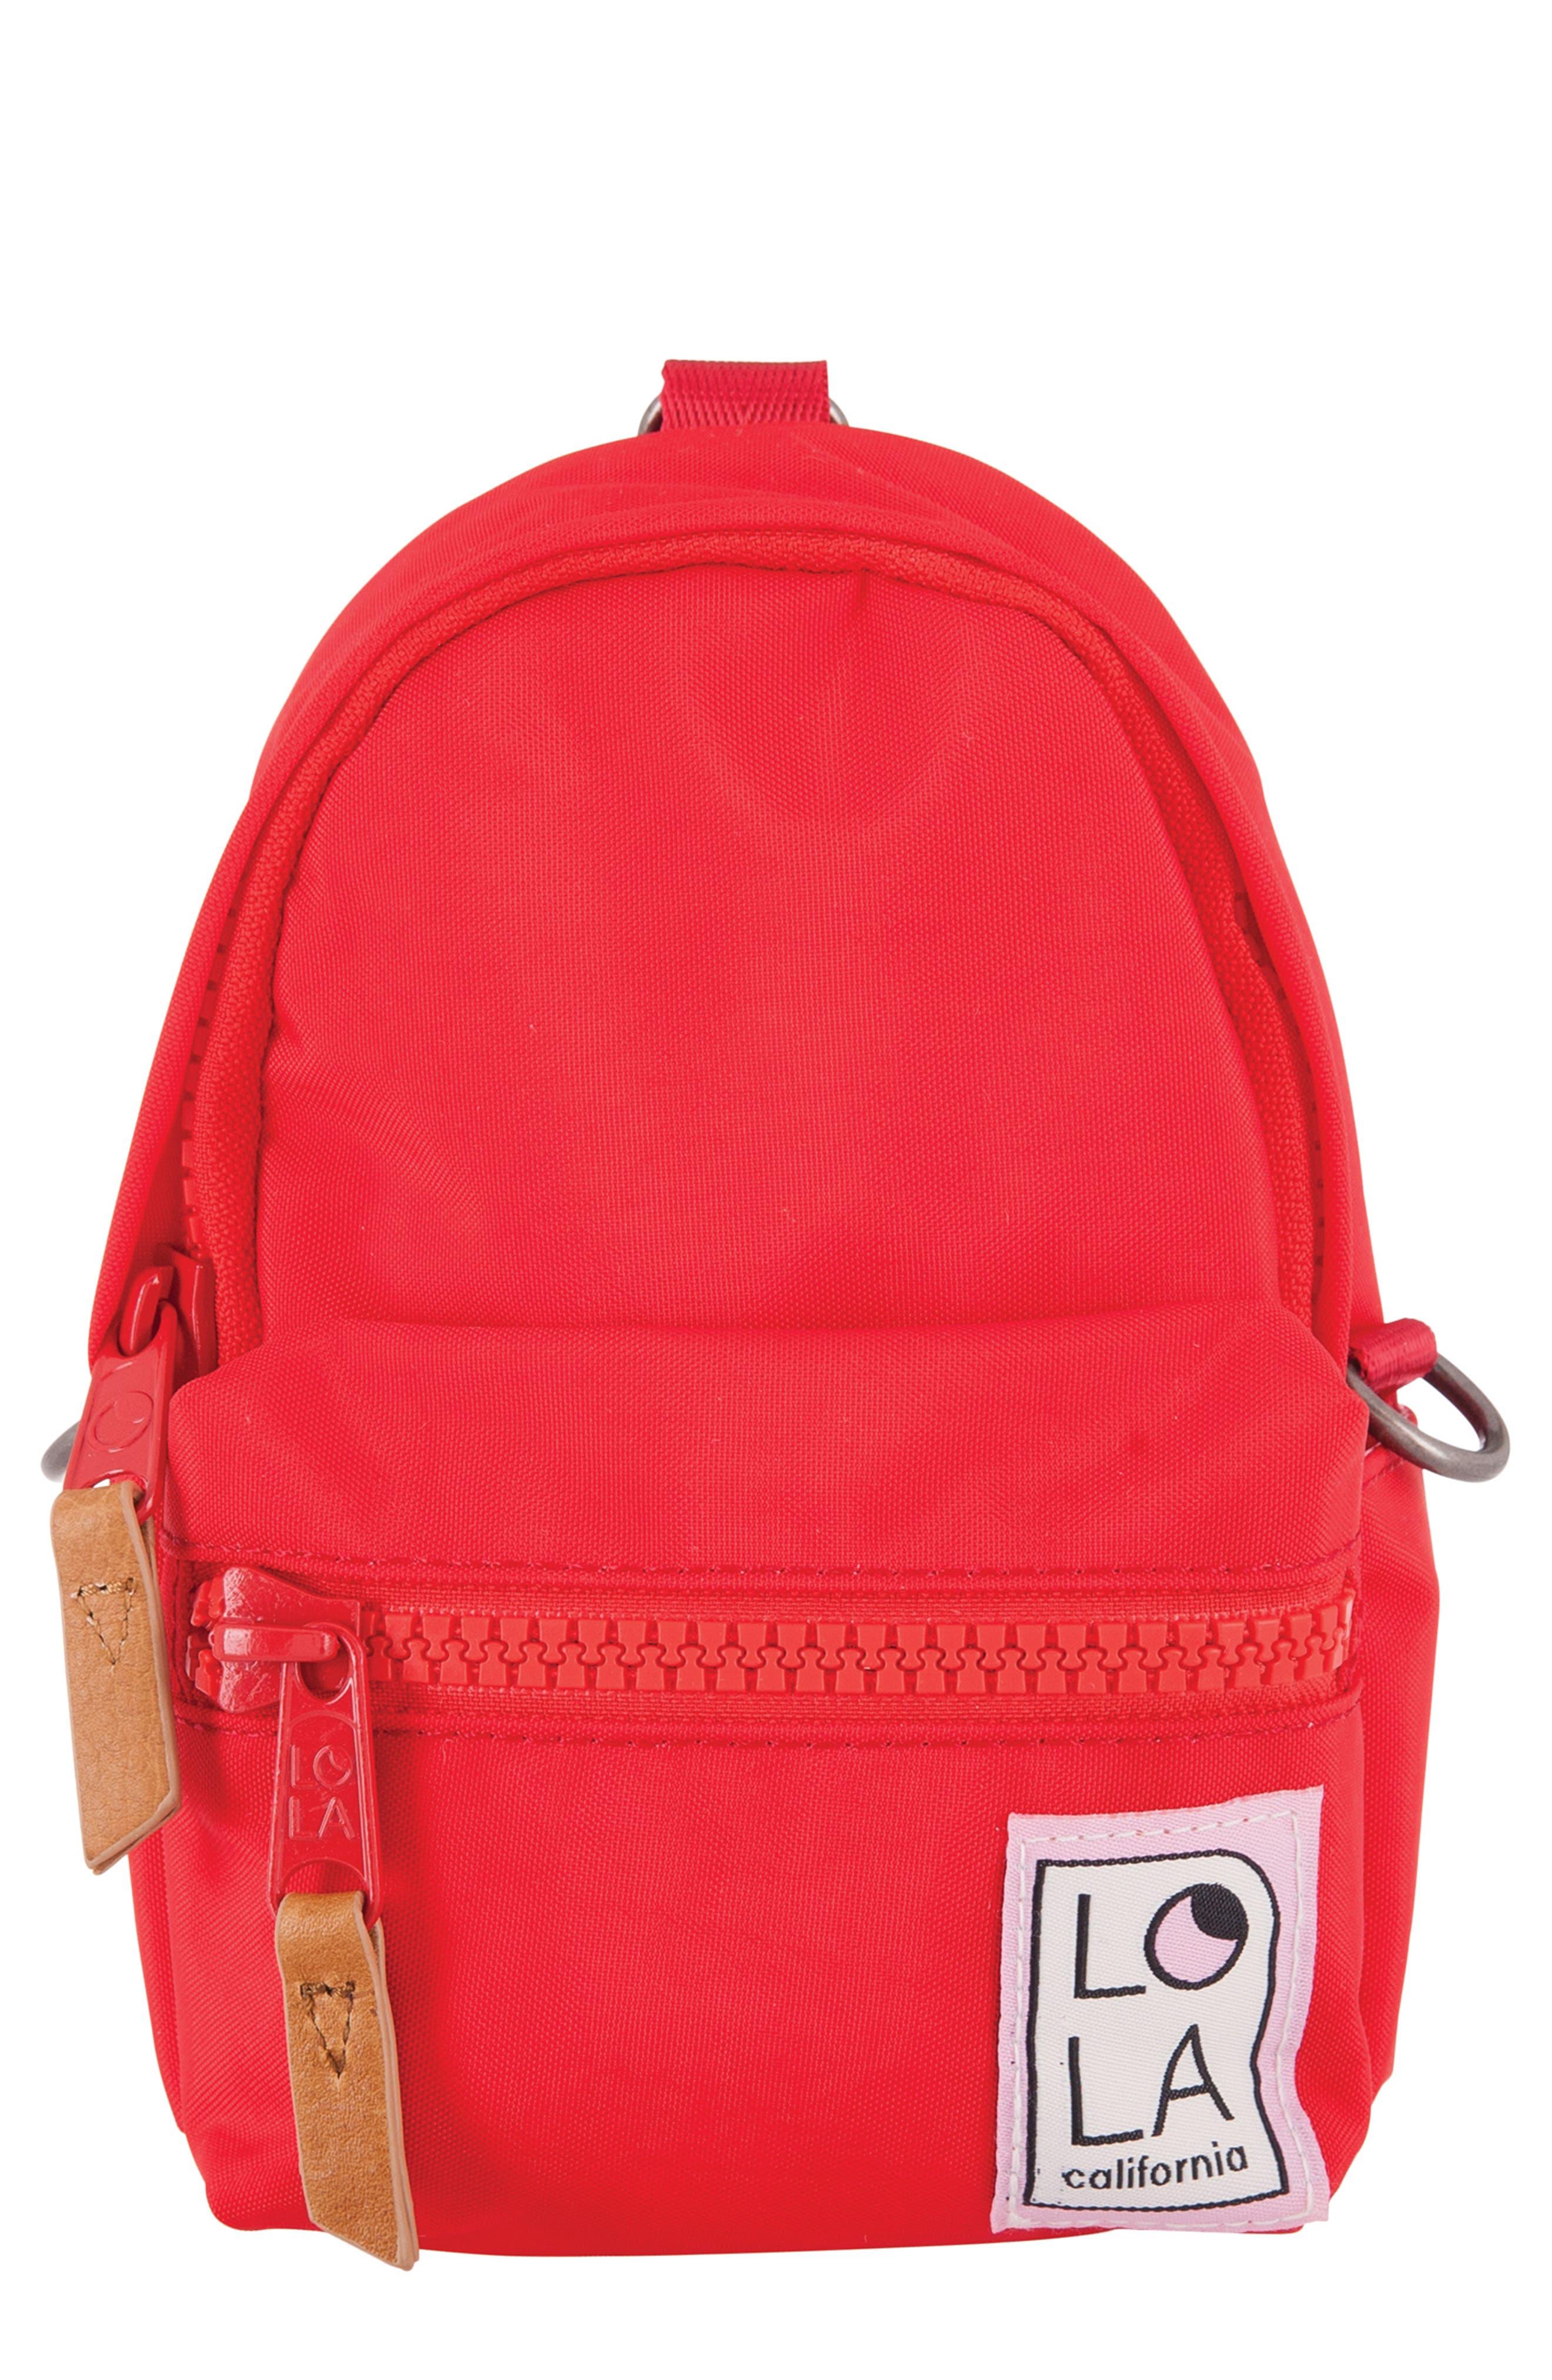 Lola Los Angeles Stargazer Mini Convertible Backpack - Red